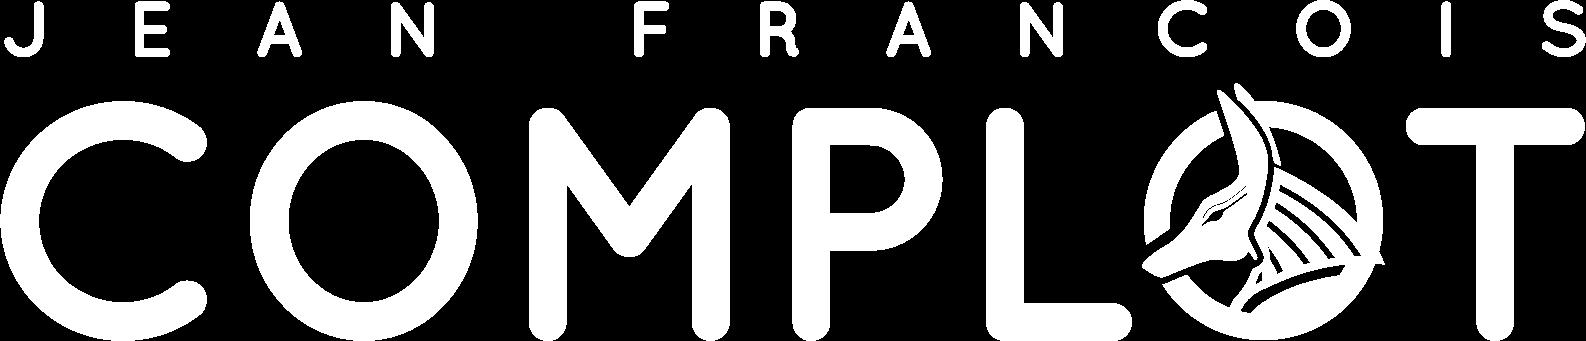 Jean Francois Complot